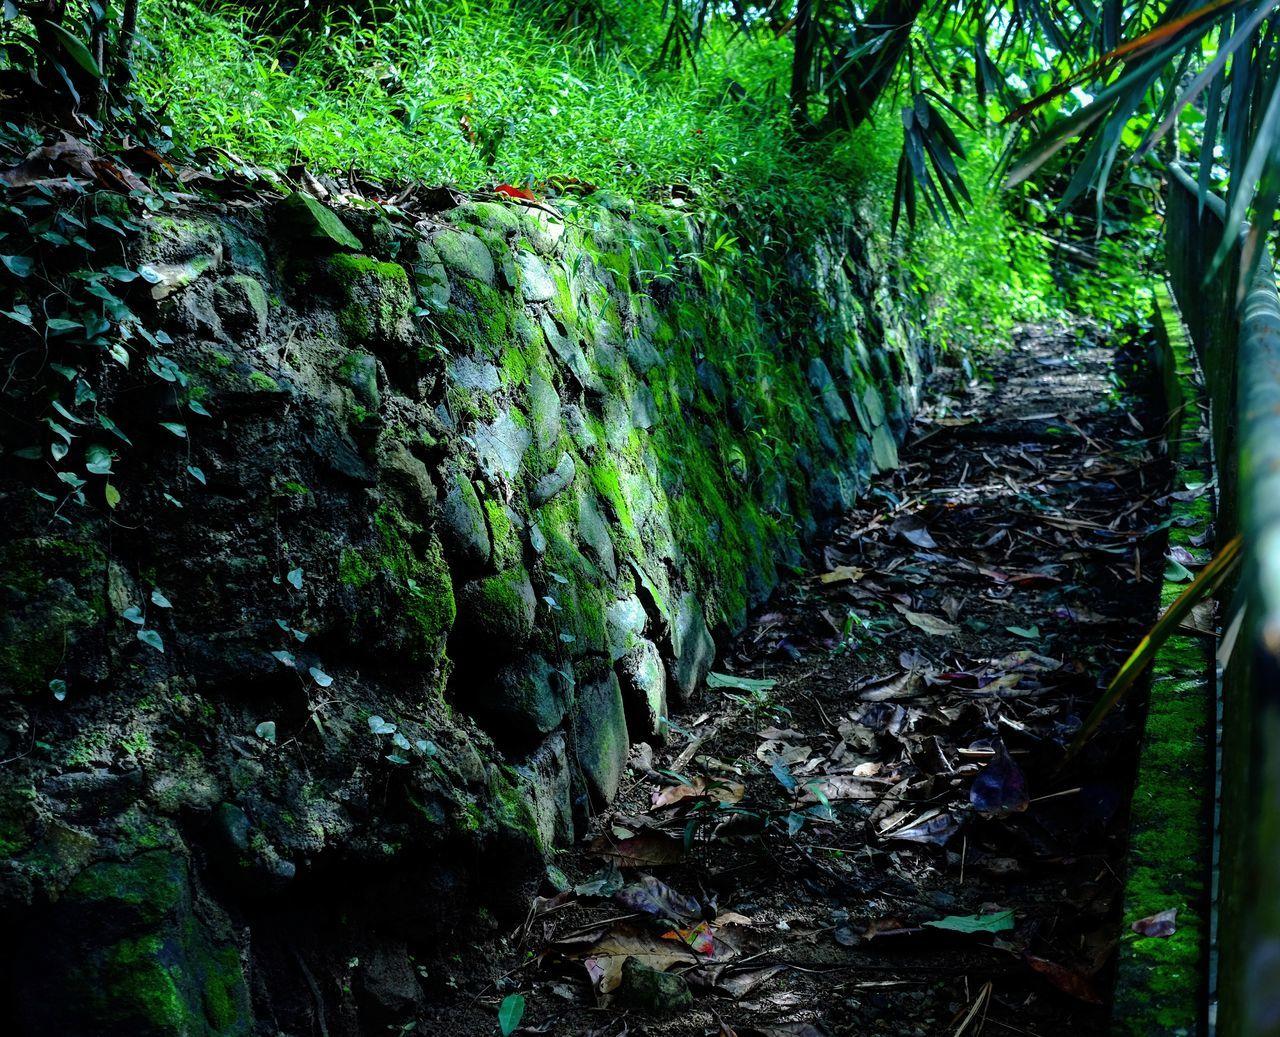 Green Color Green Grass Path Pathway Antipolo Touchofglory Rizal Philippines Prayermountain